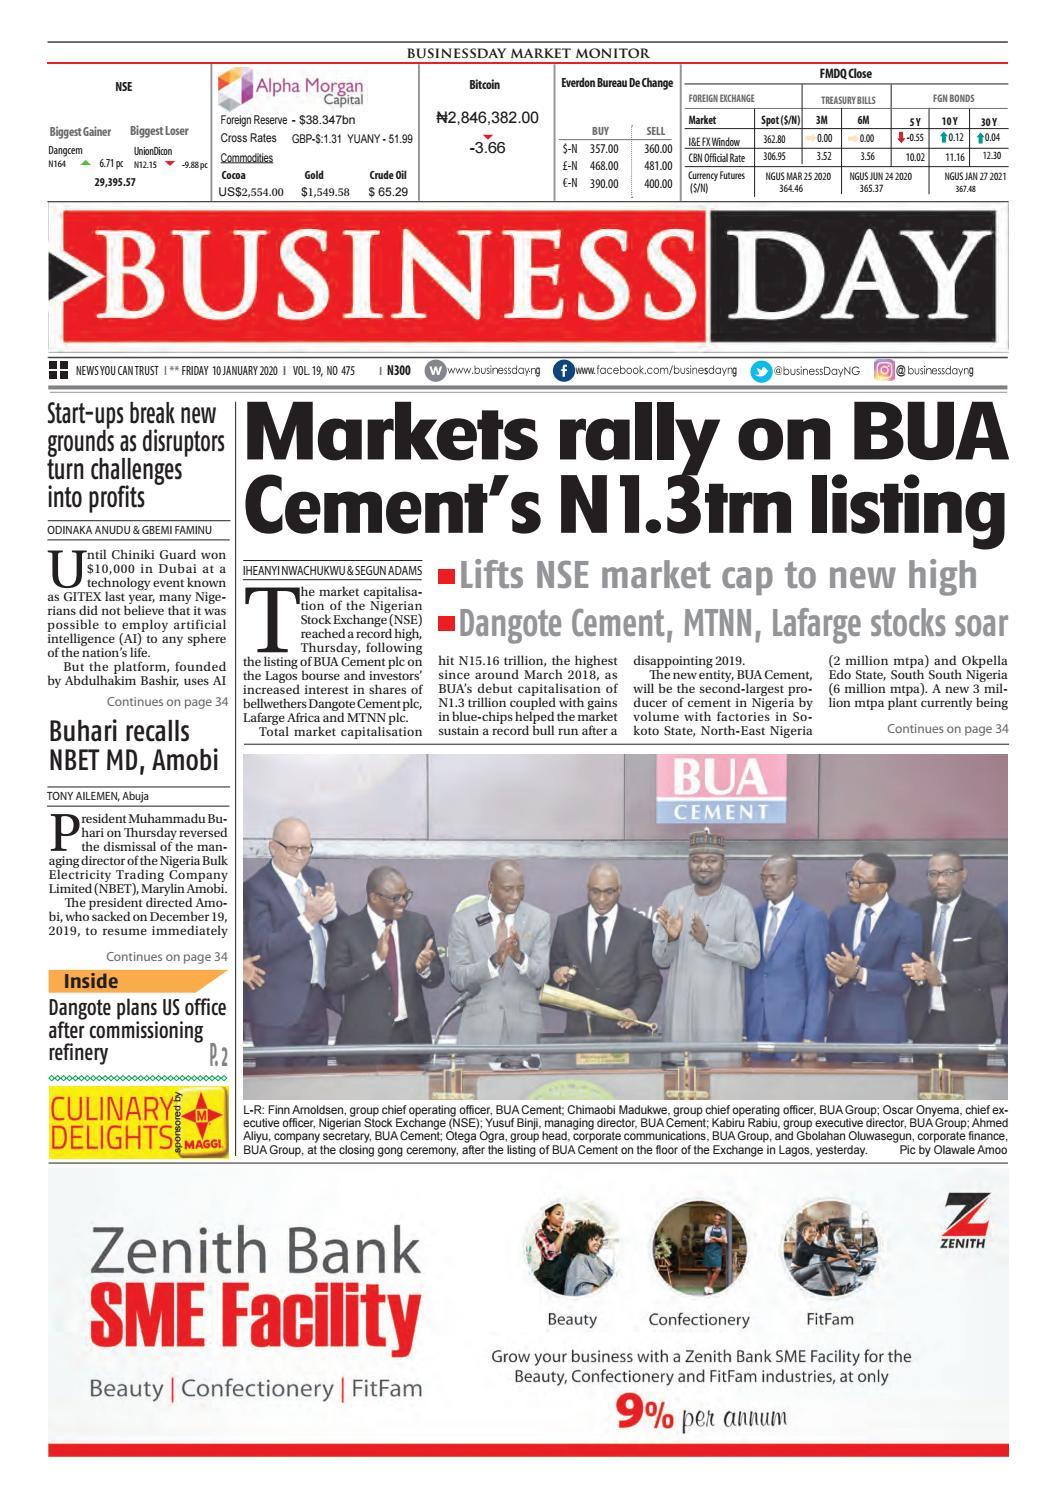 BusinessDay 10 Jan 2020 by BusinessDay issuu